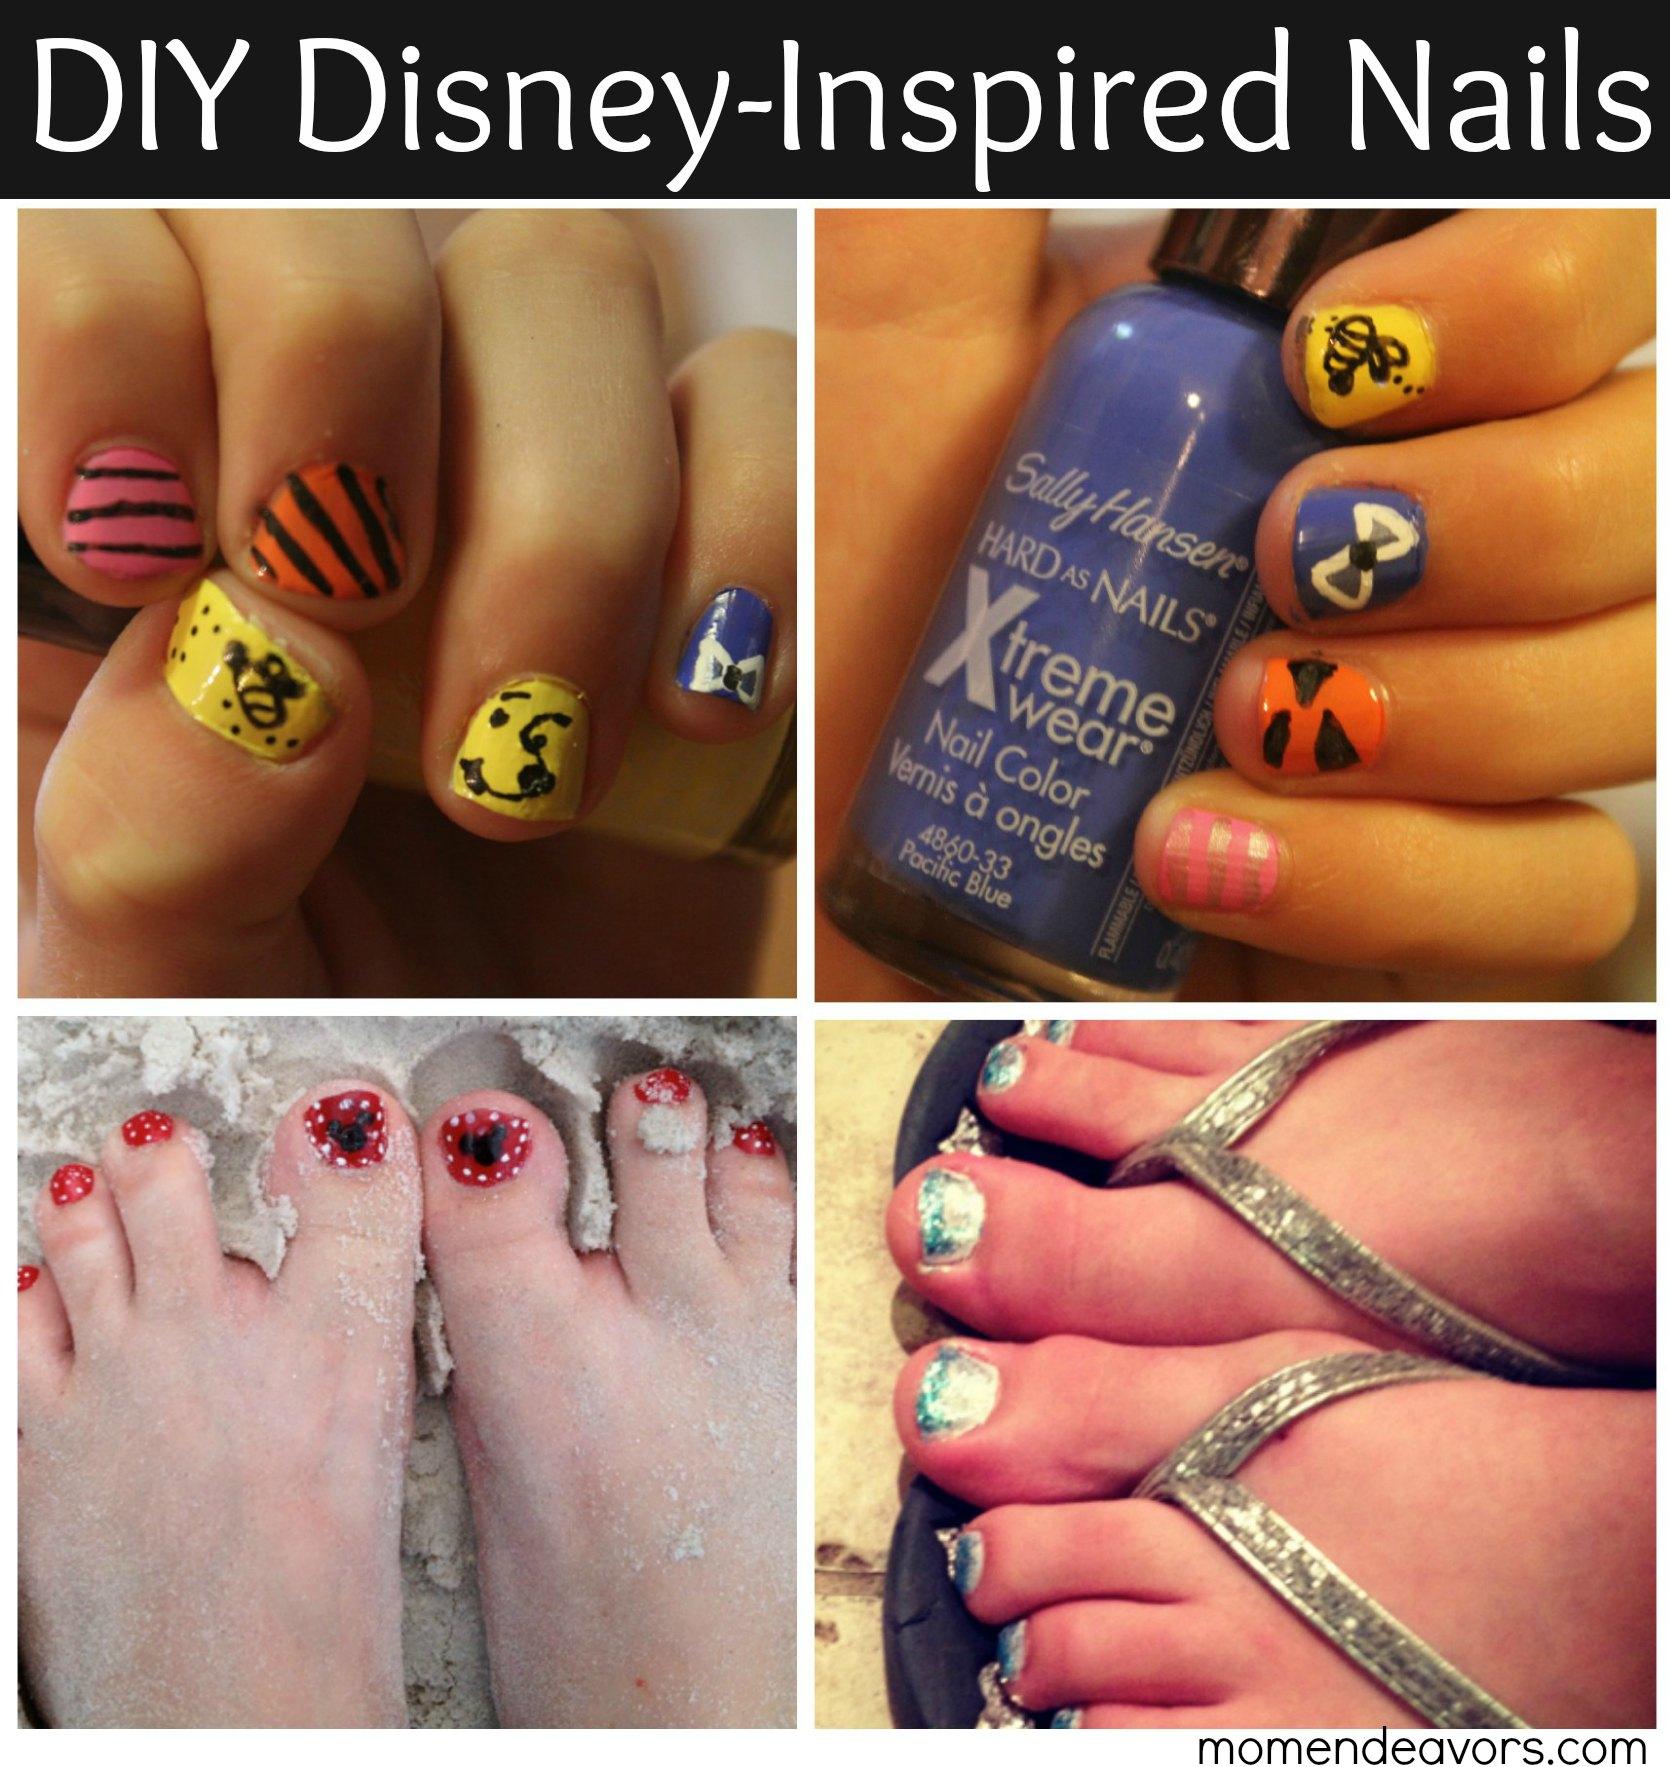 Diy disney inspired nail art iheartmynailart diy disney inspired nails solutioingenieria Images